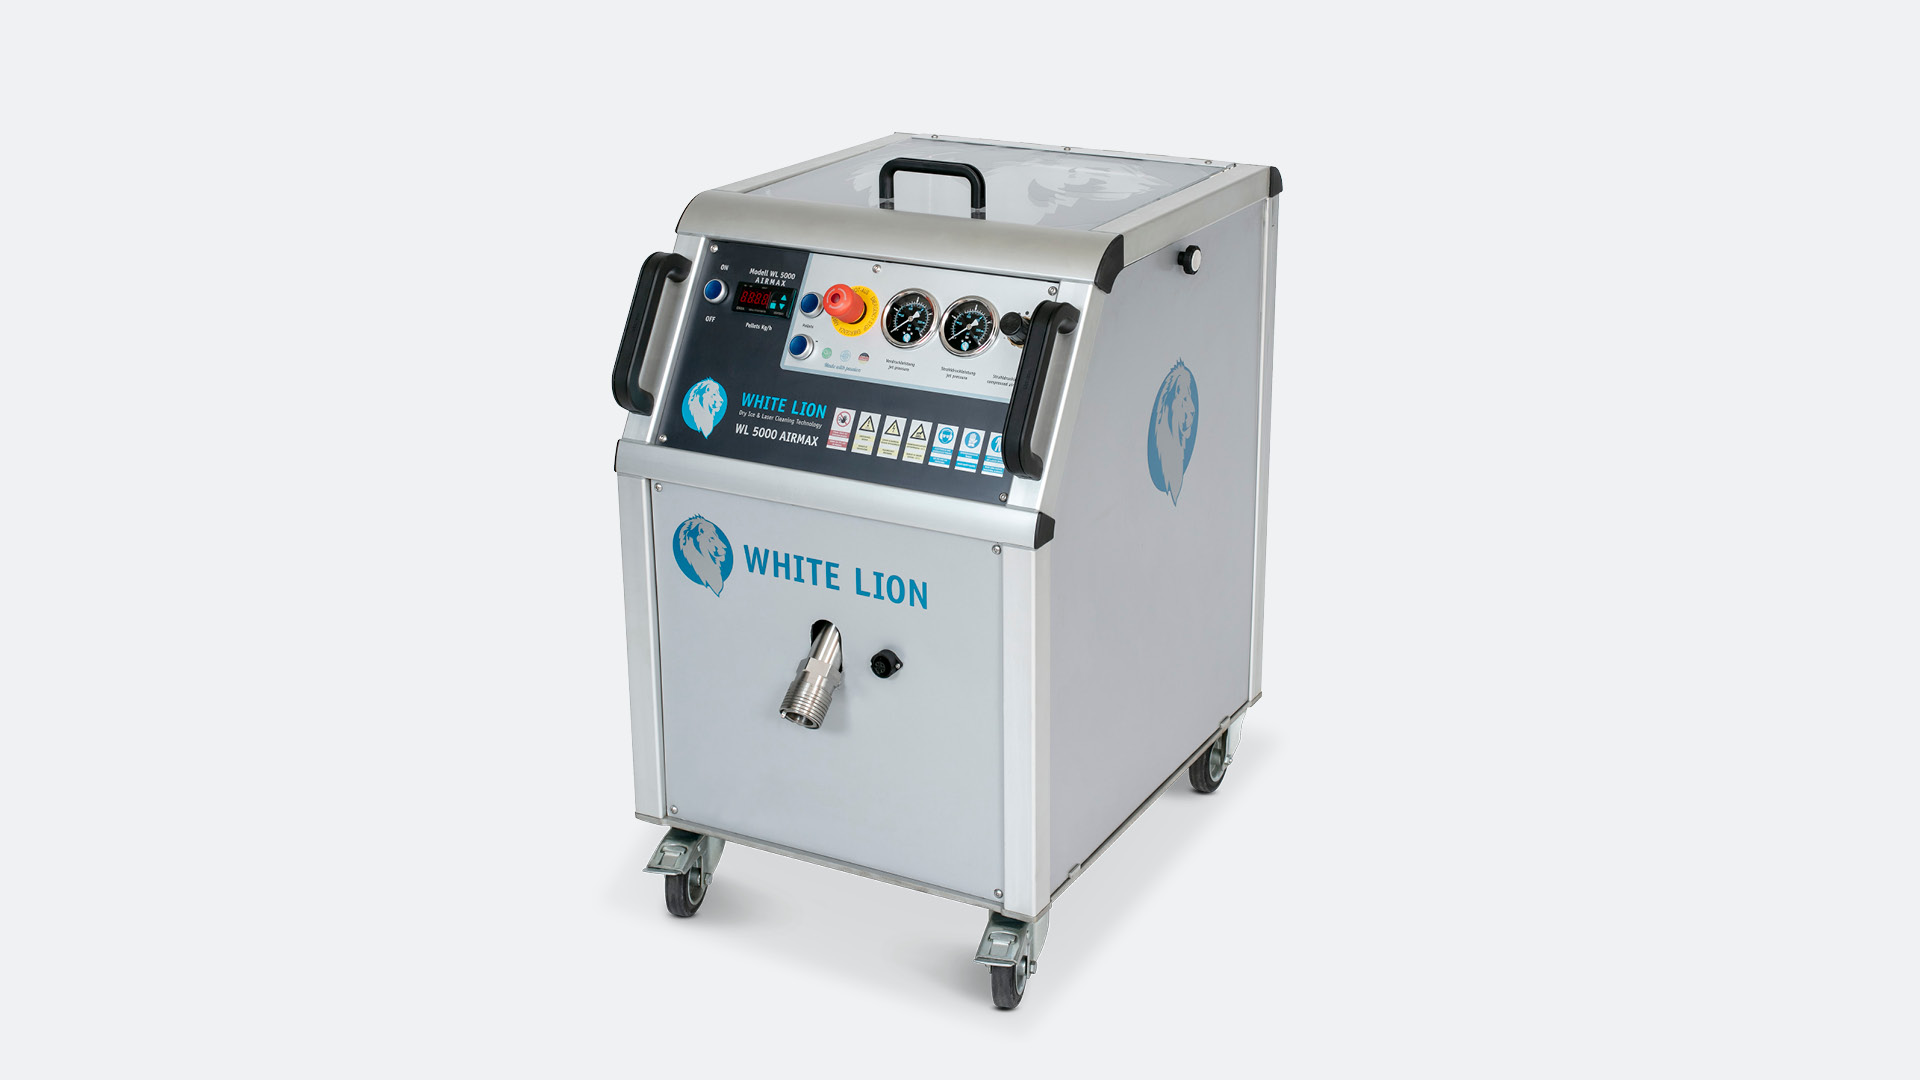 WL 5000